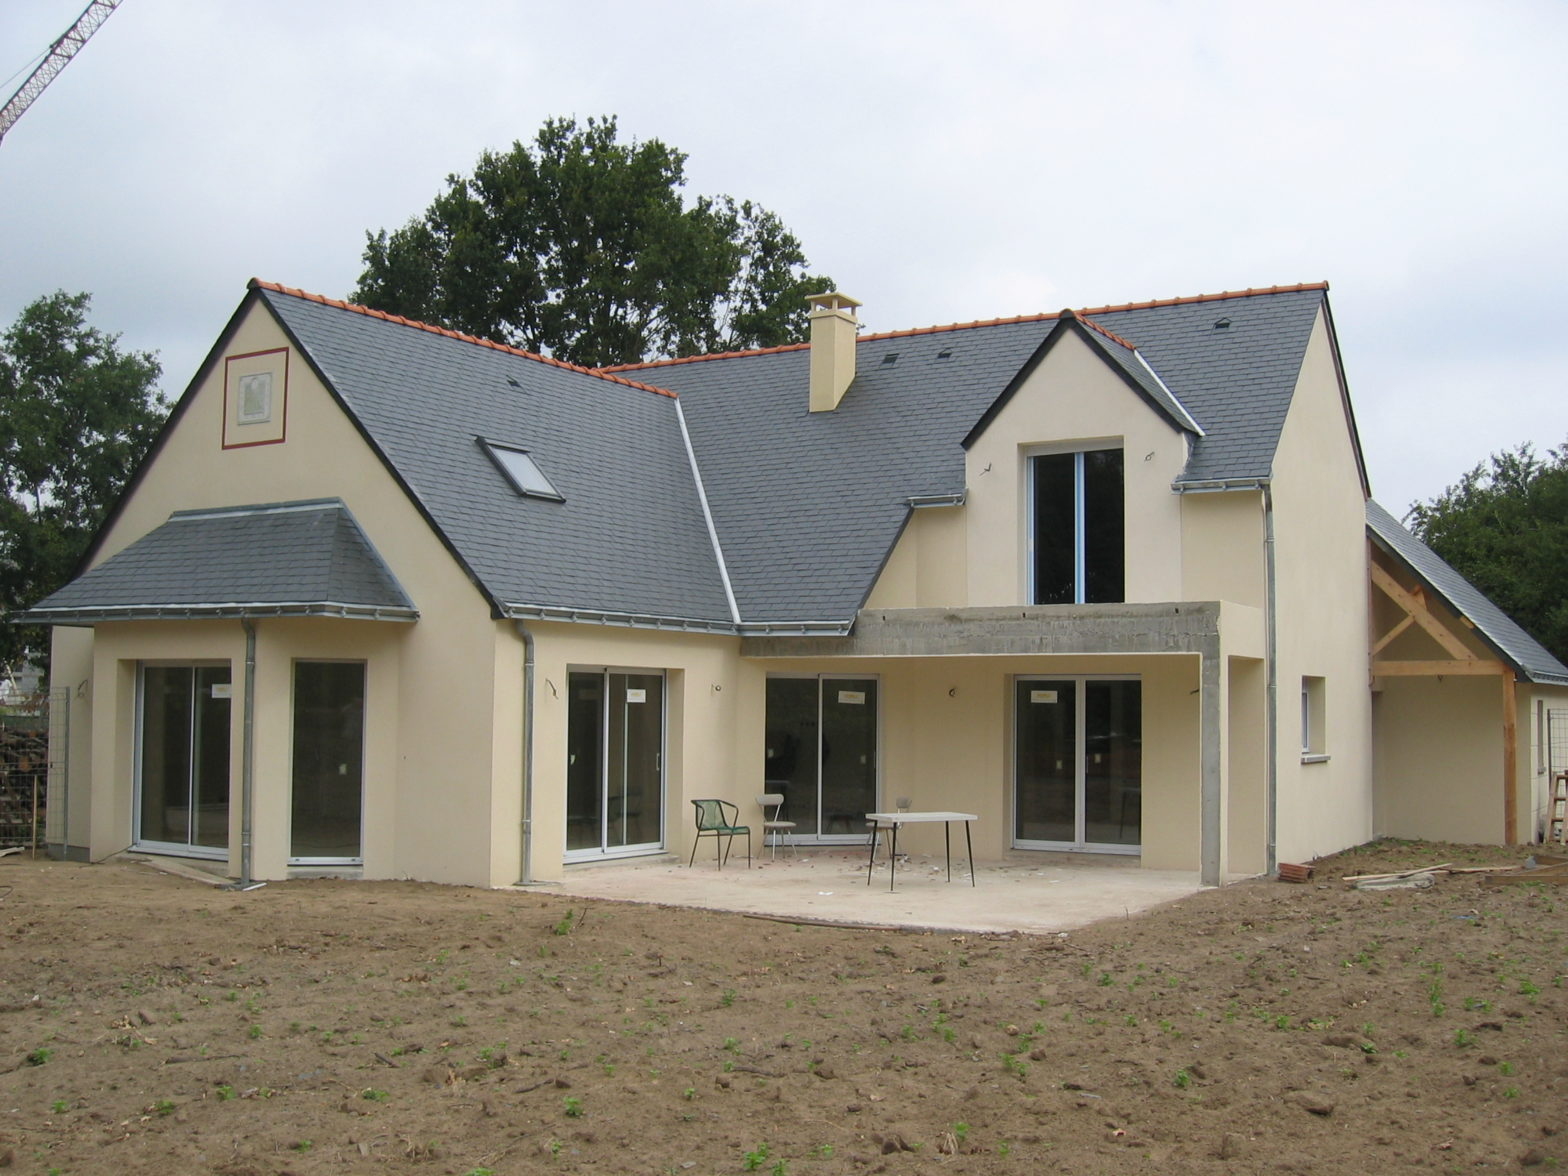 maison, etage, comble, toiture ardoise, angers